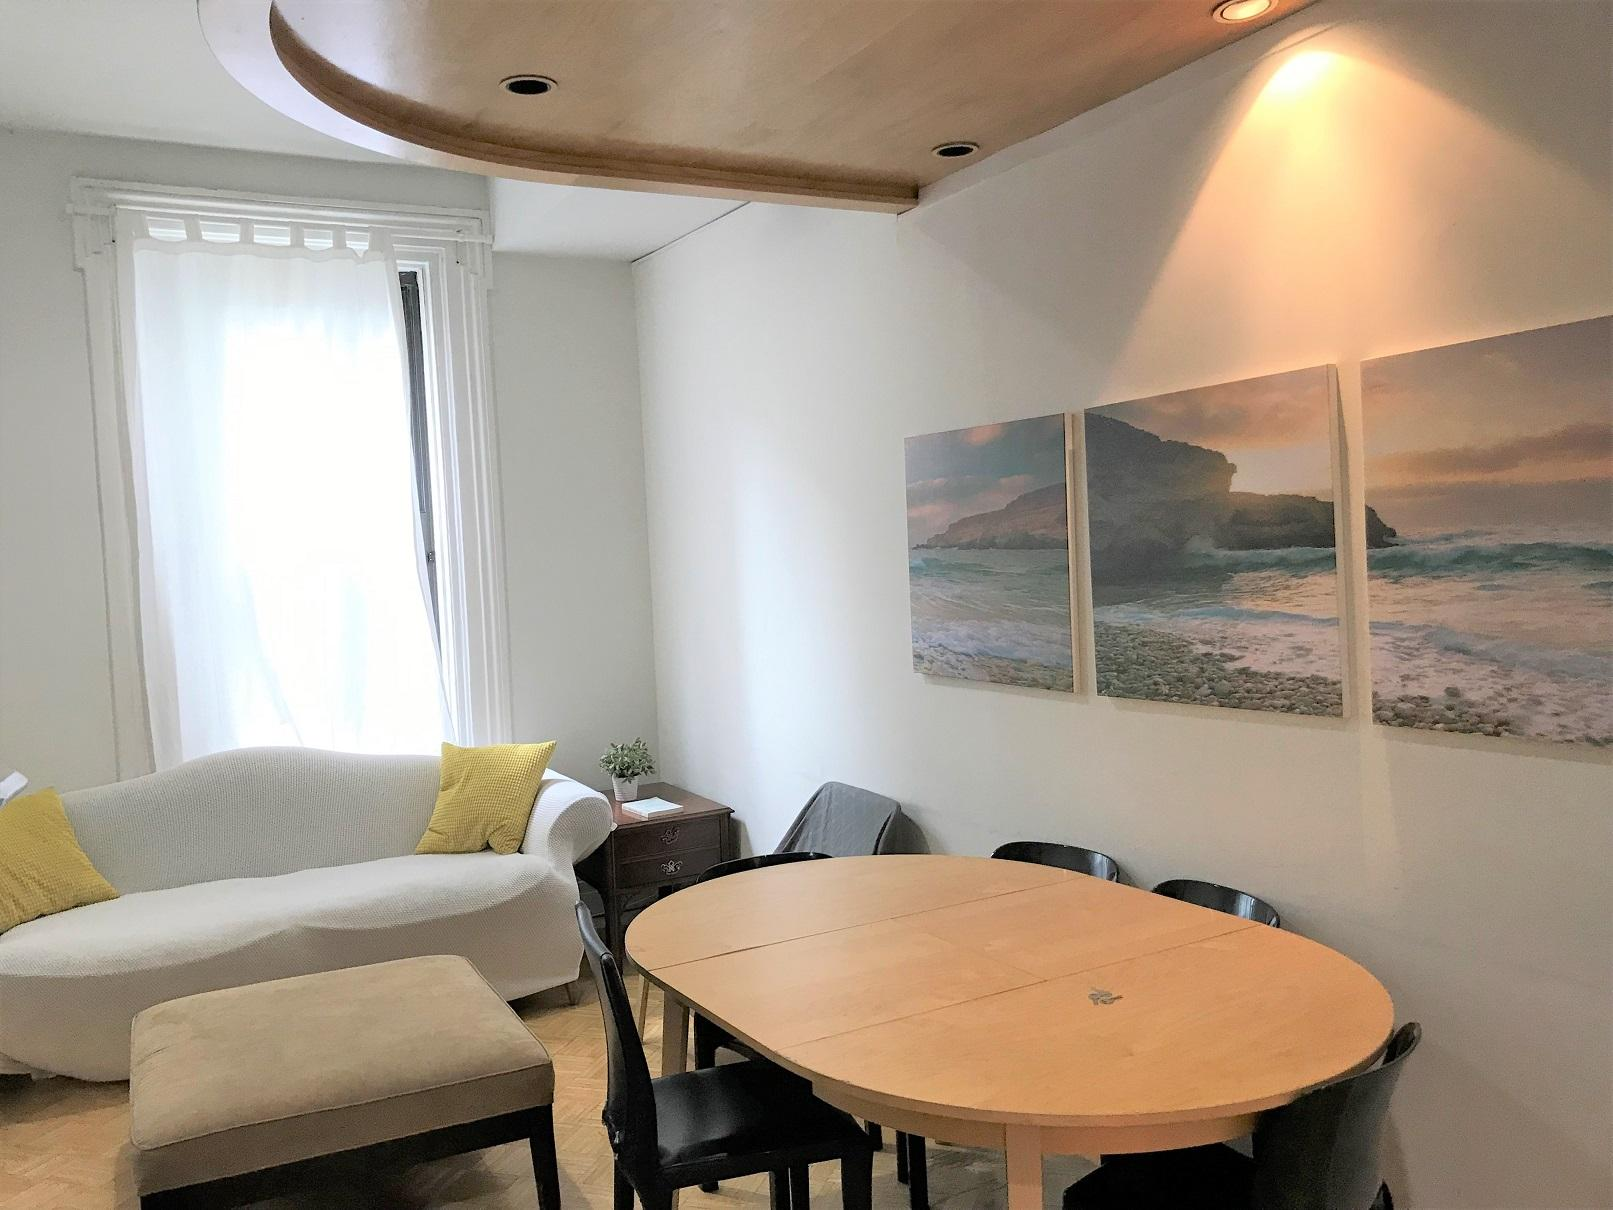 Apartment Park Avenue 3 Bedroom 1 Bath photo 8522852